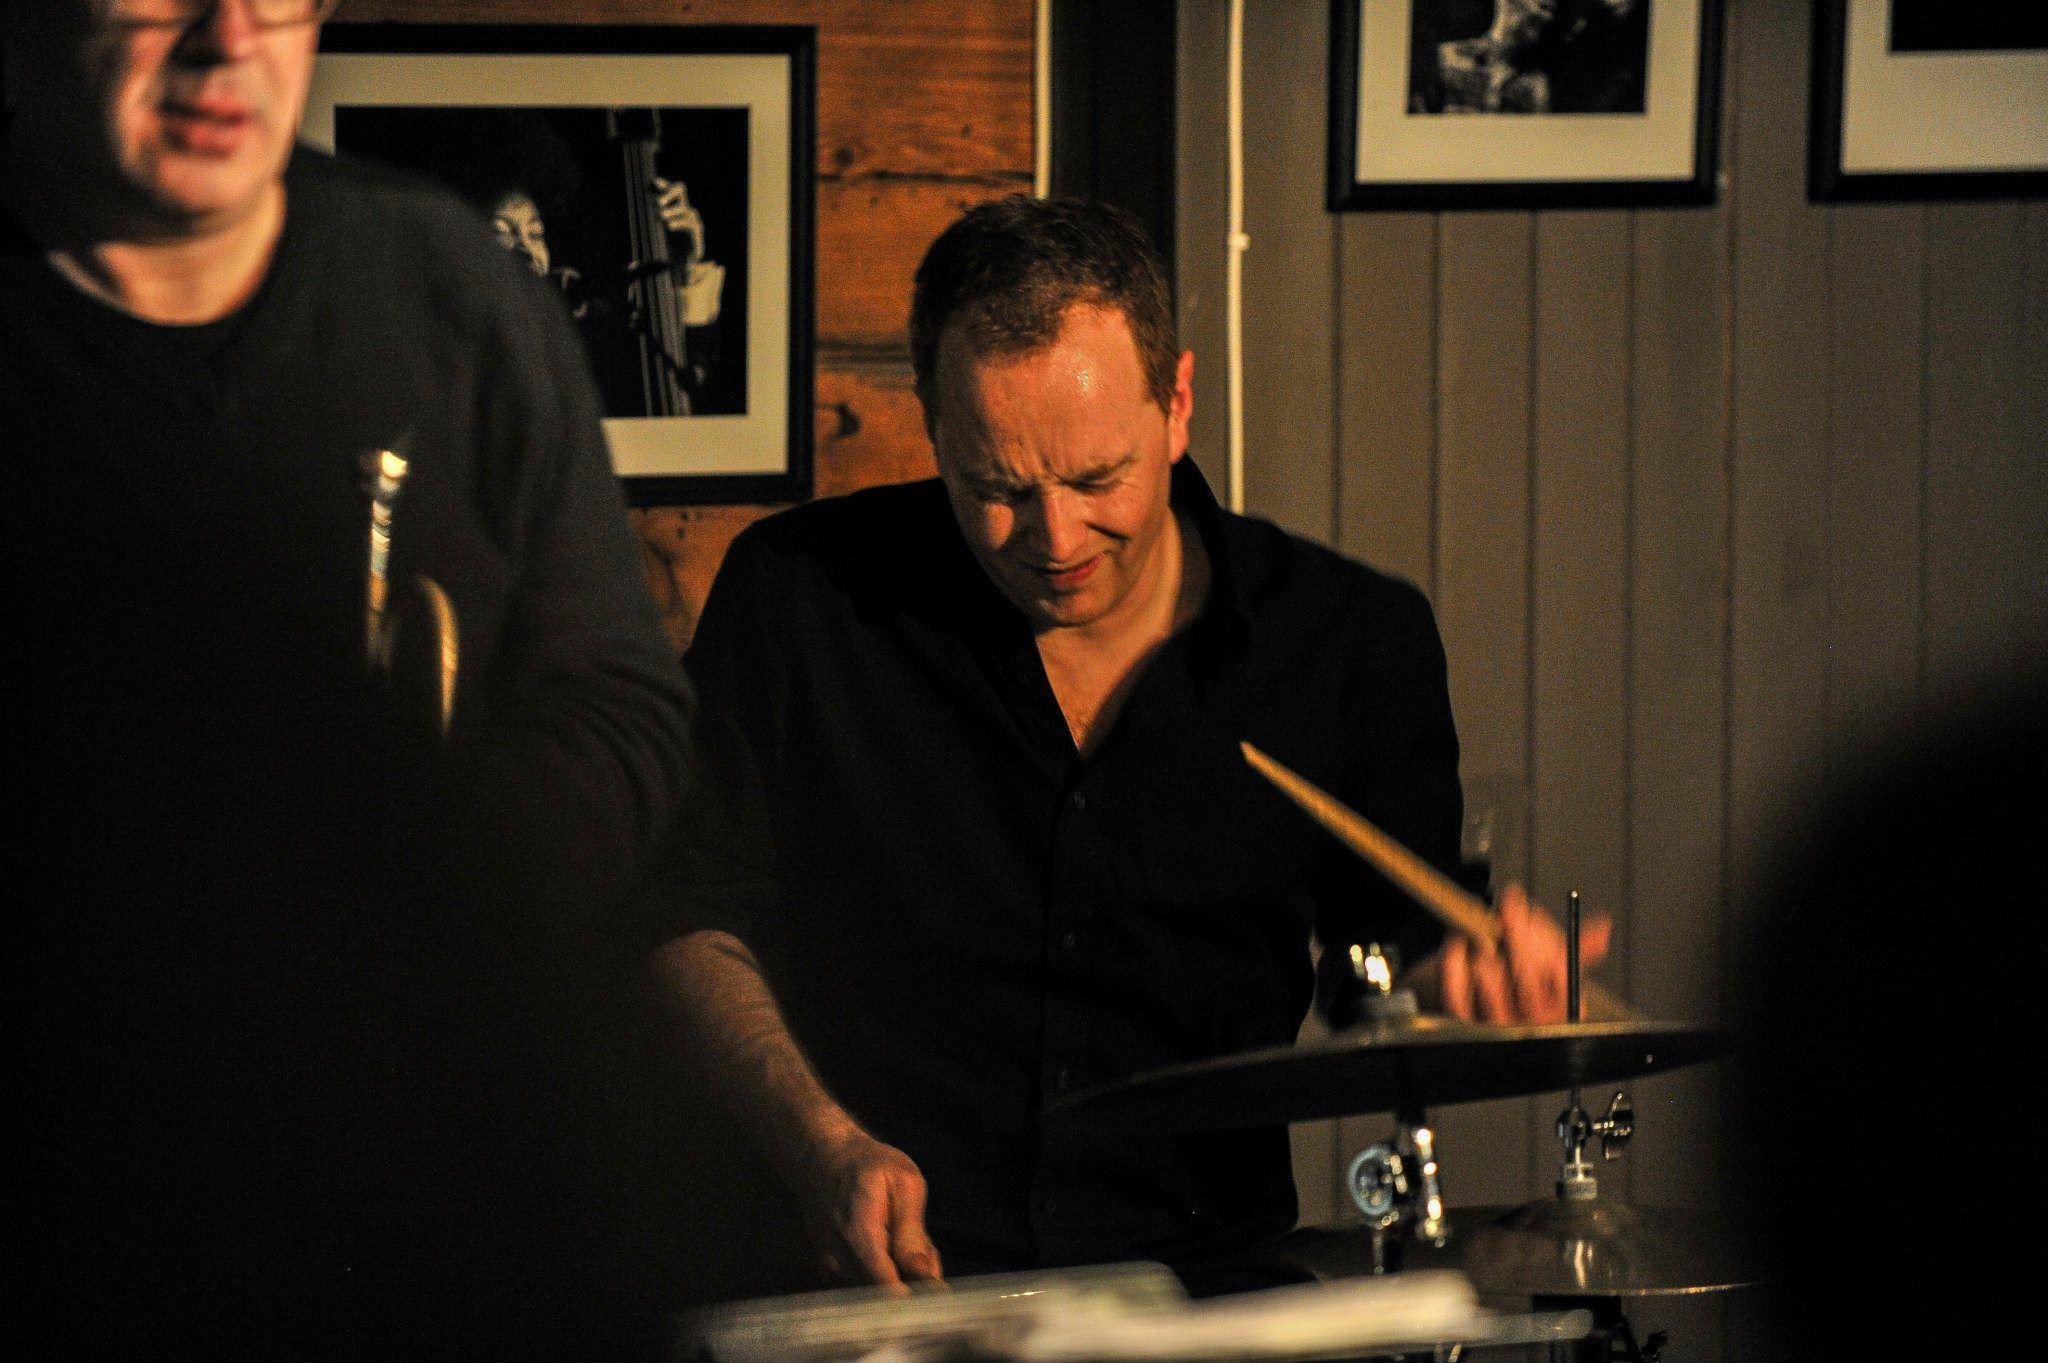 Daniel Lilleeng, Tromsø Jazzfestival